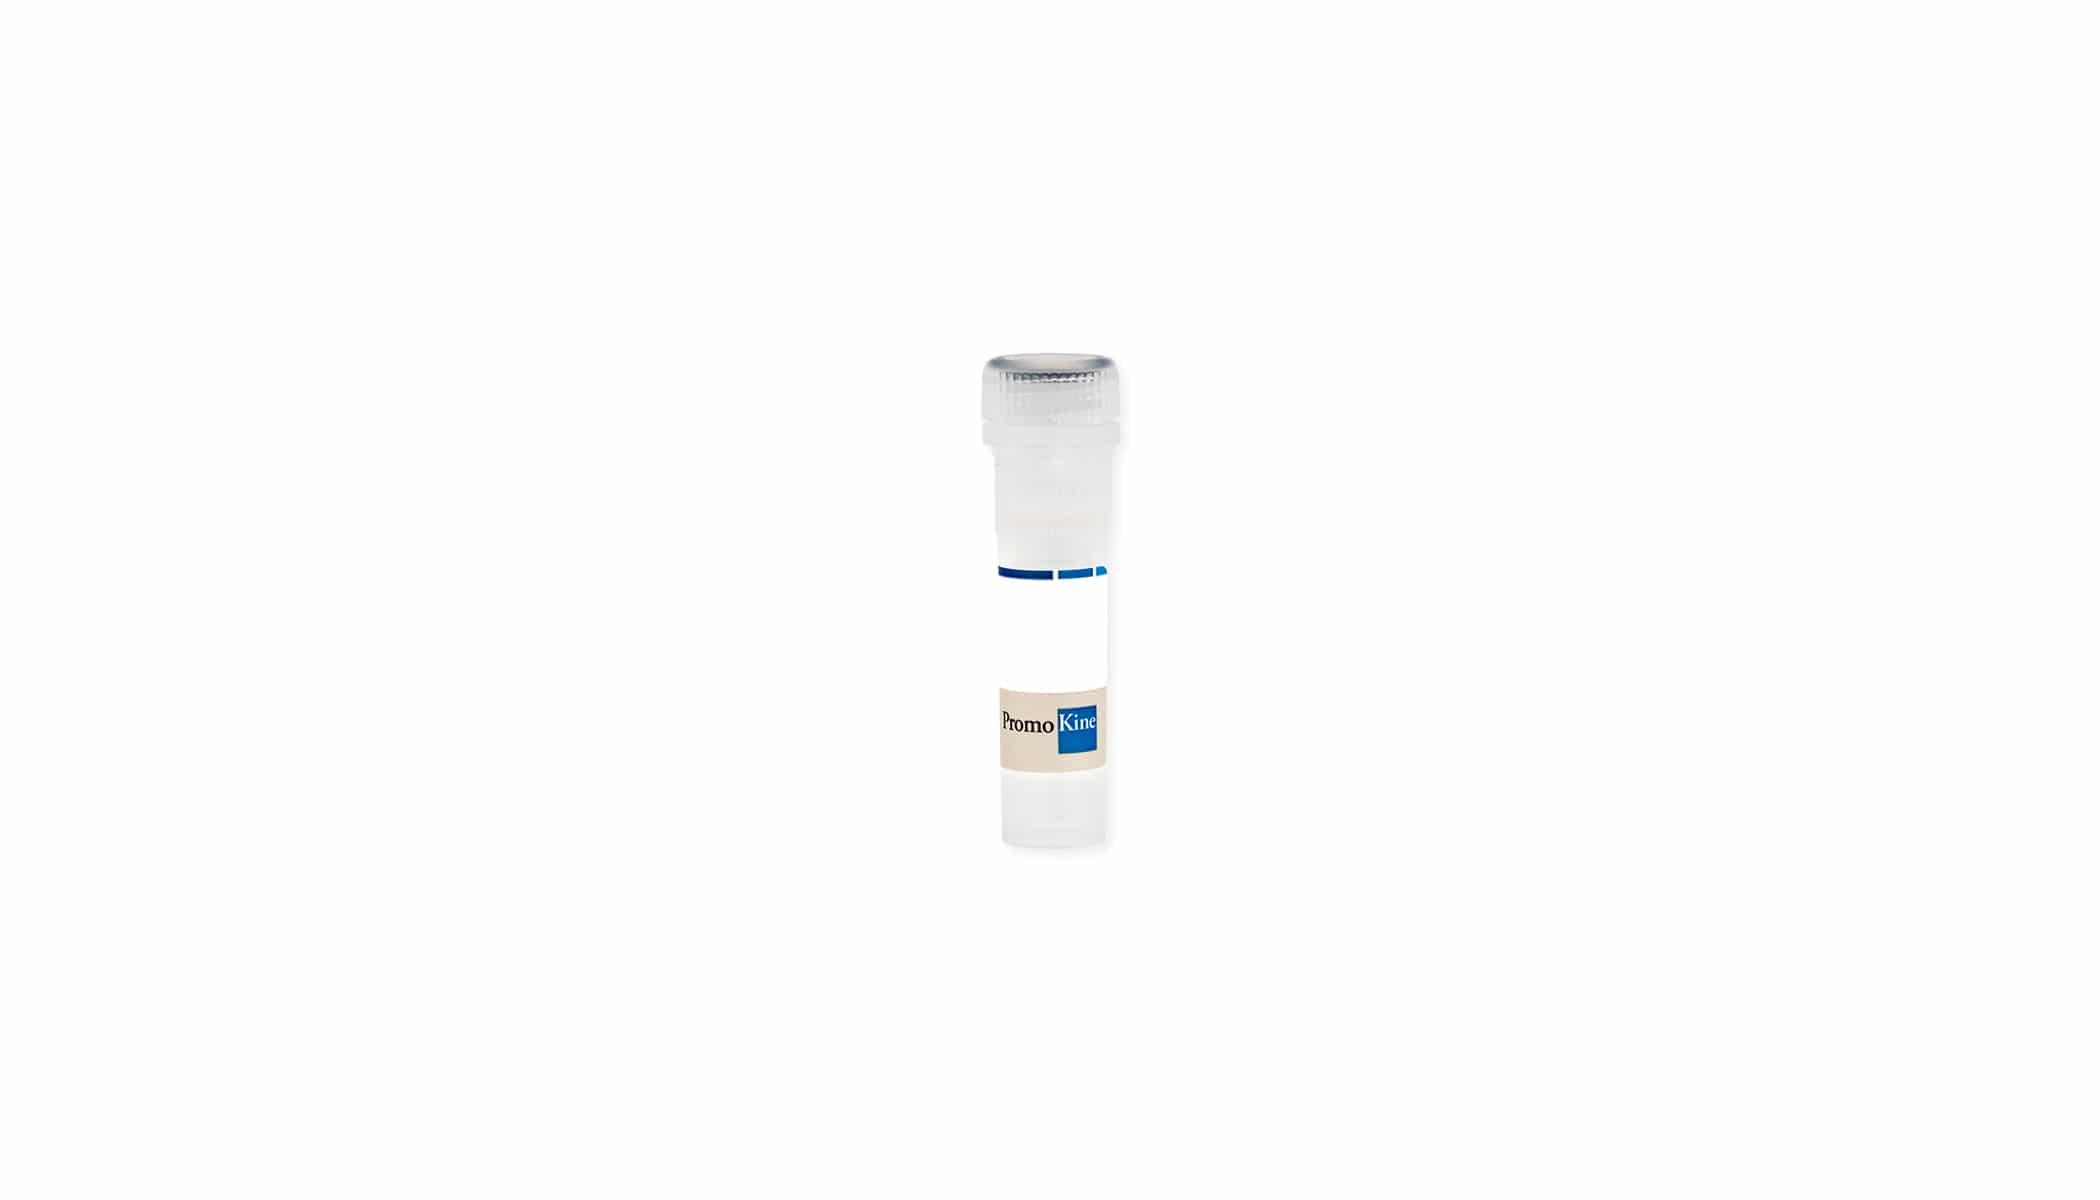 PromoFectin-mRNA